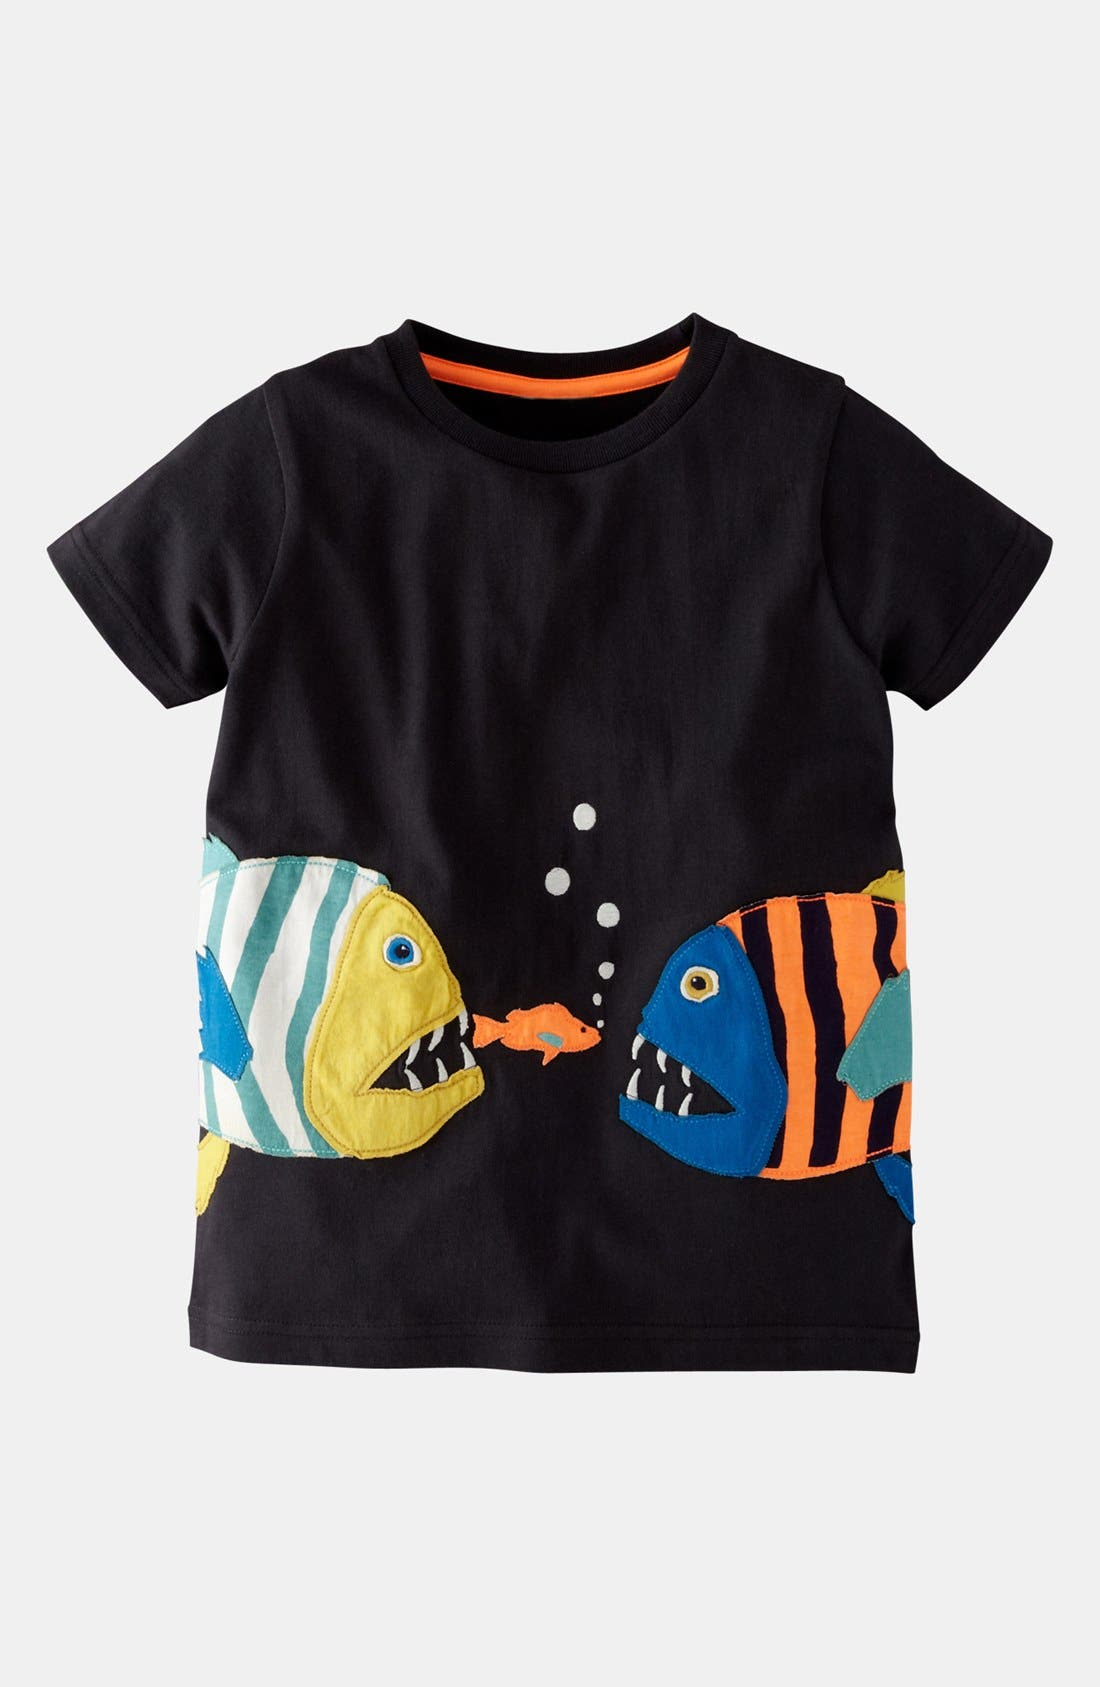 Main Image - Mini Boden 'Creatures of the Deep' T-Shirt (Toddler, Little Boys & Big Boys)